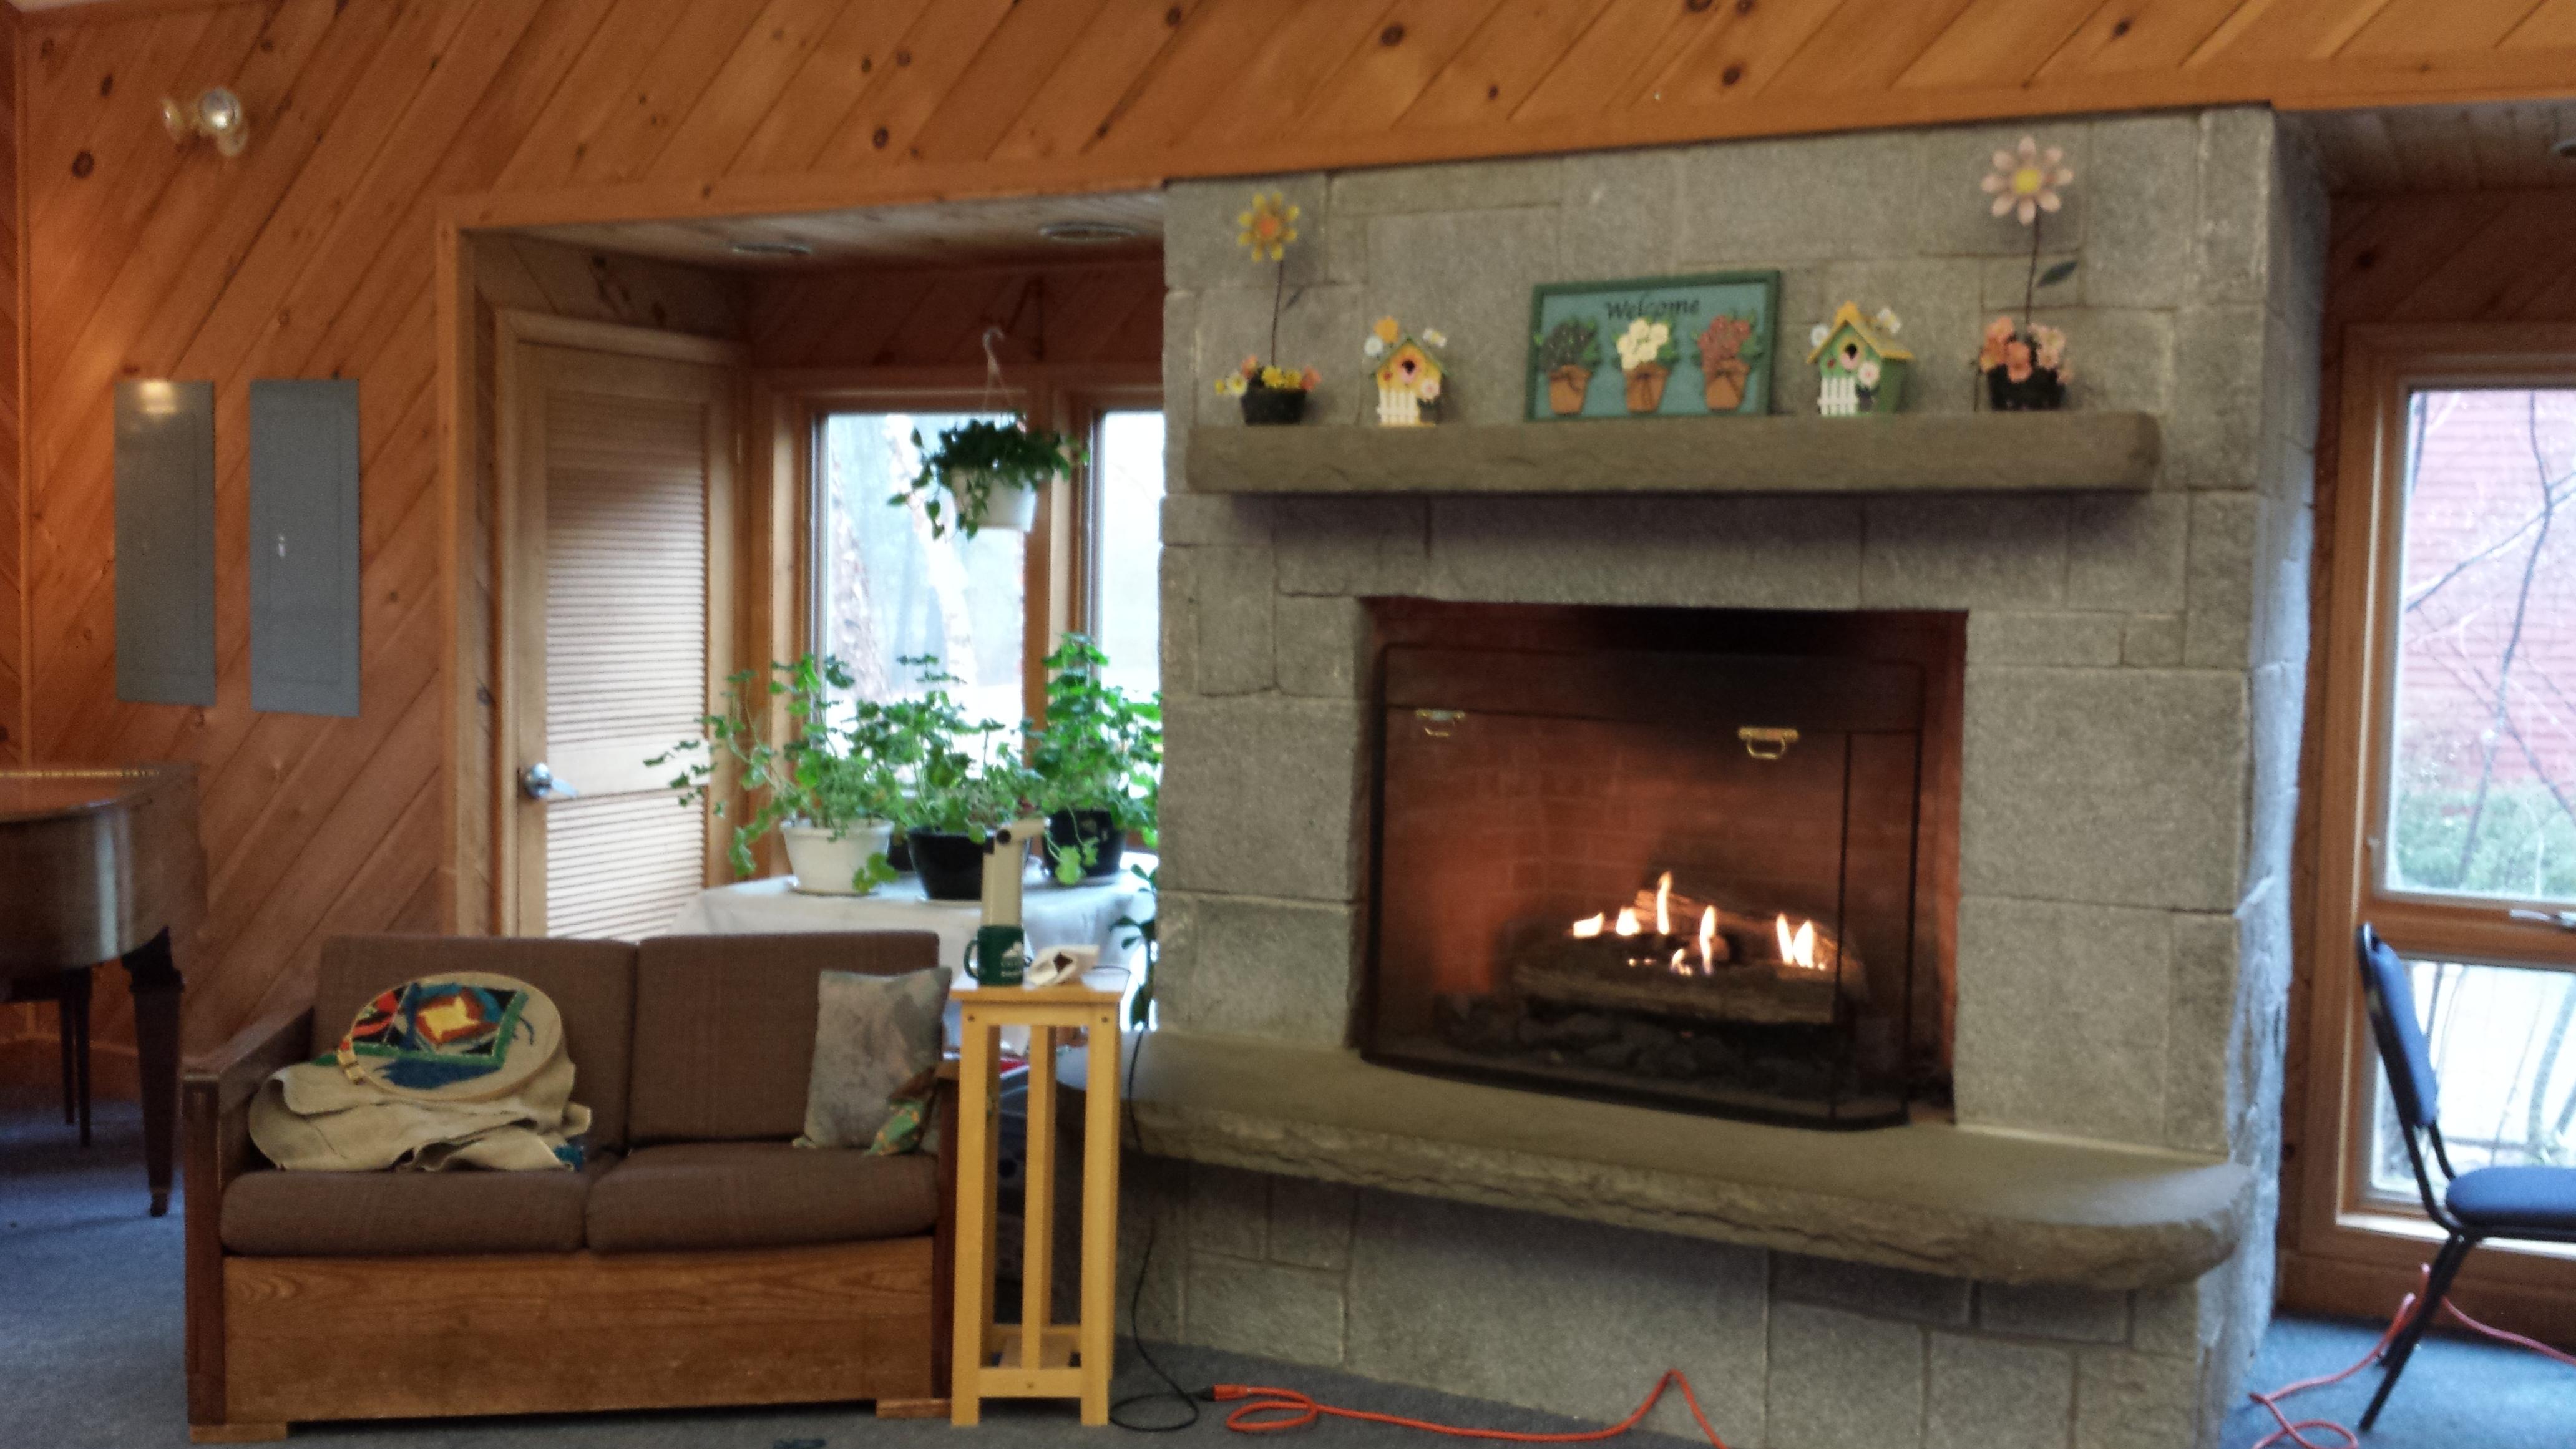 Calumet Fire Place